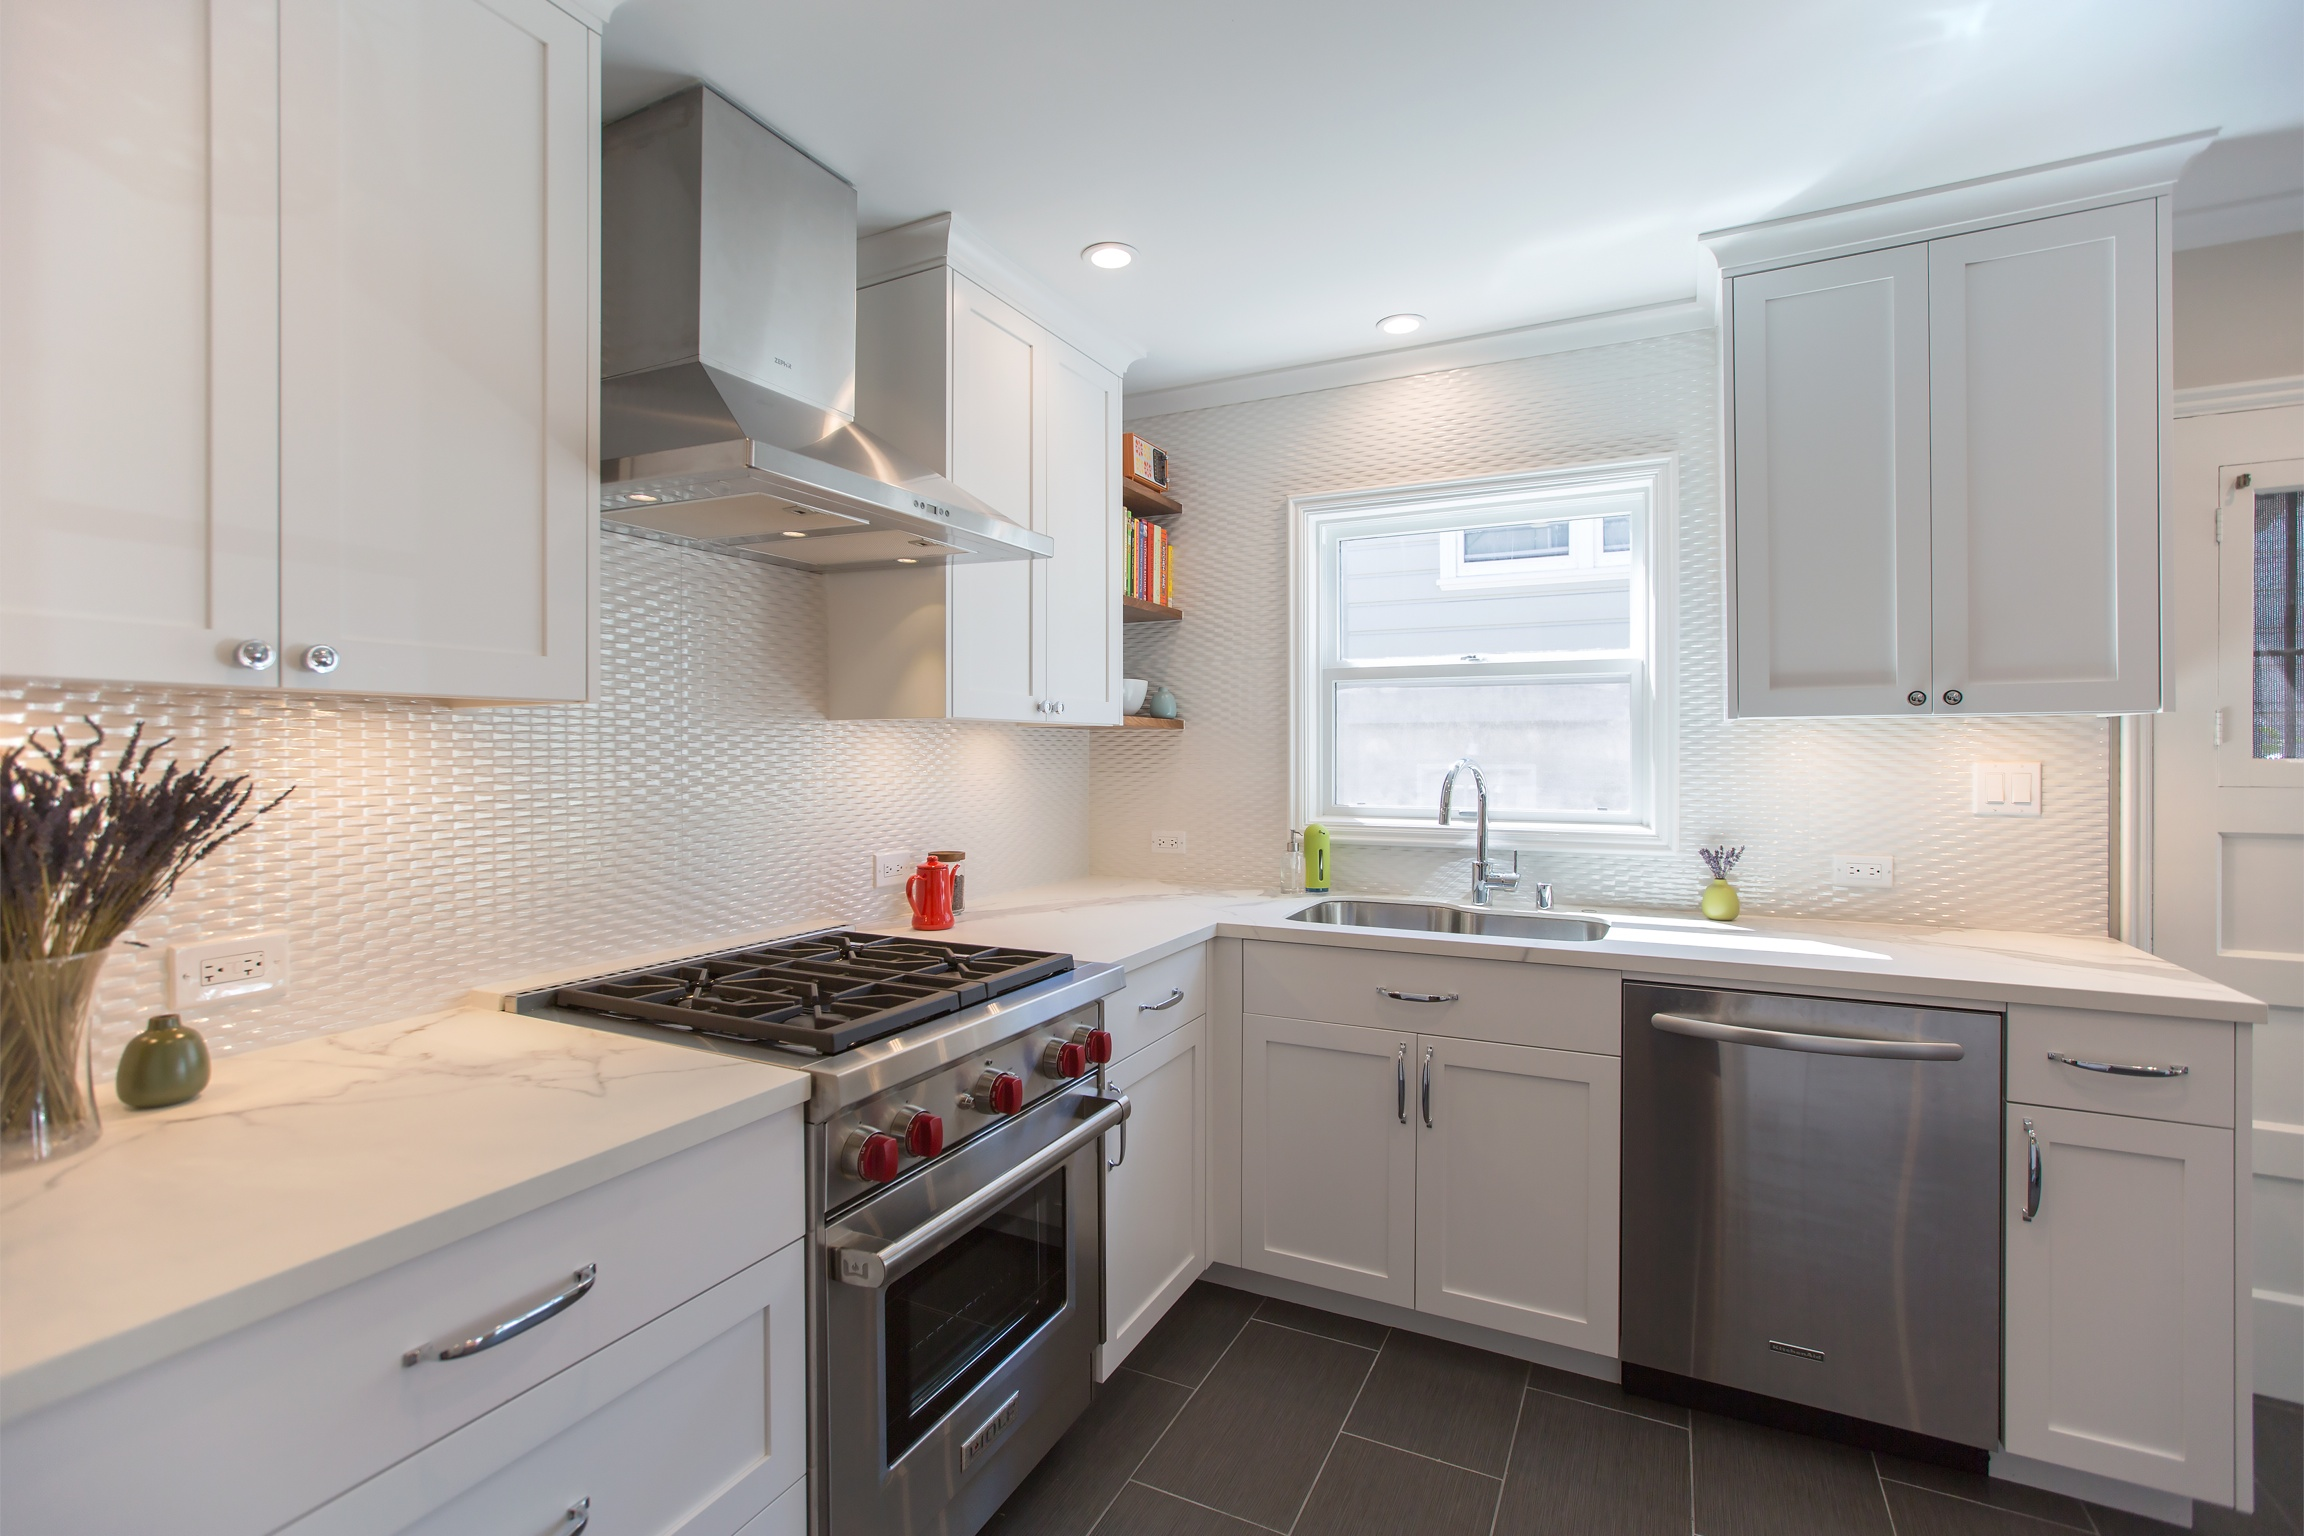 william-adams-design-clement-kitchen-white-cabinets-grey-tile-floors-white-backsplash-range-sink-dishwasher.jpg